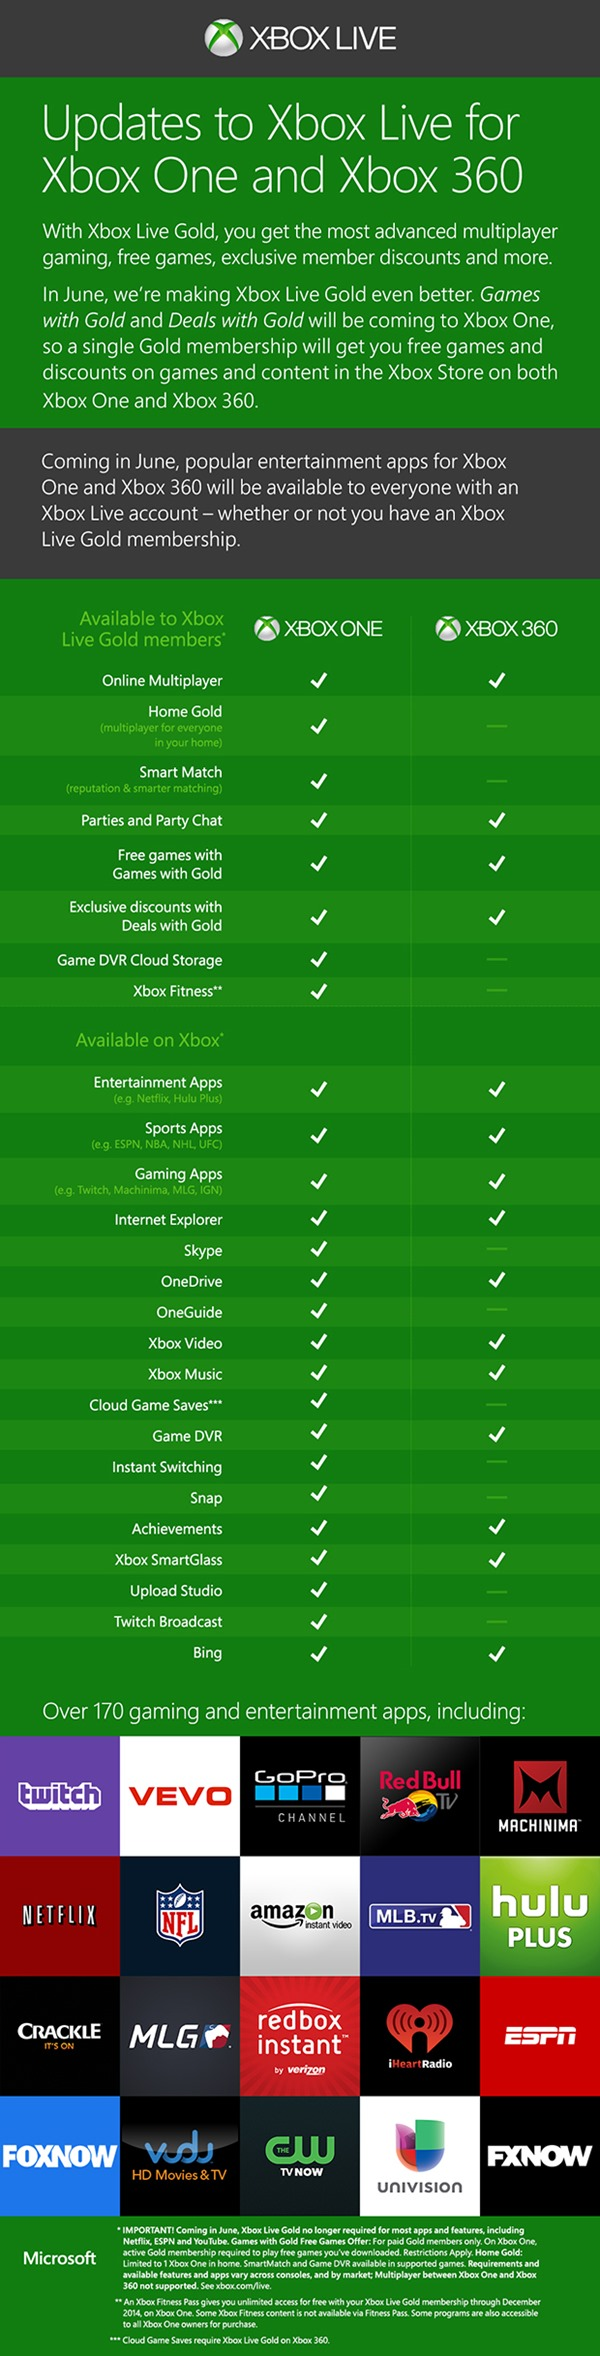 Xbox LIVE chart